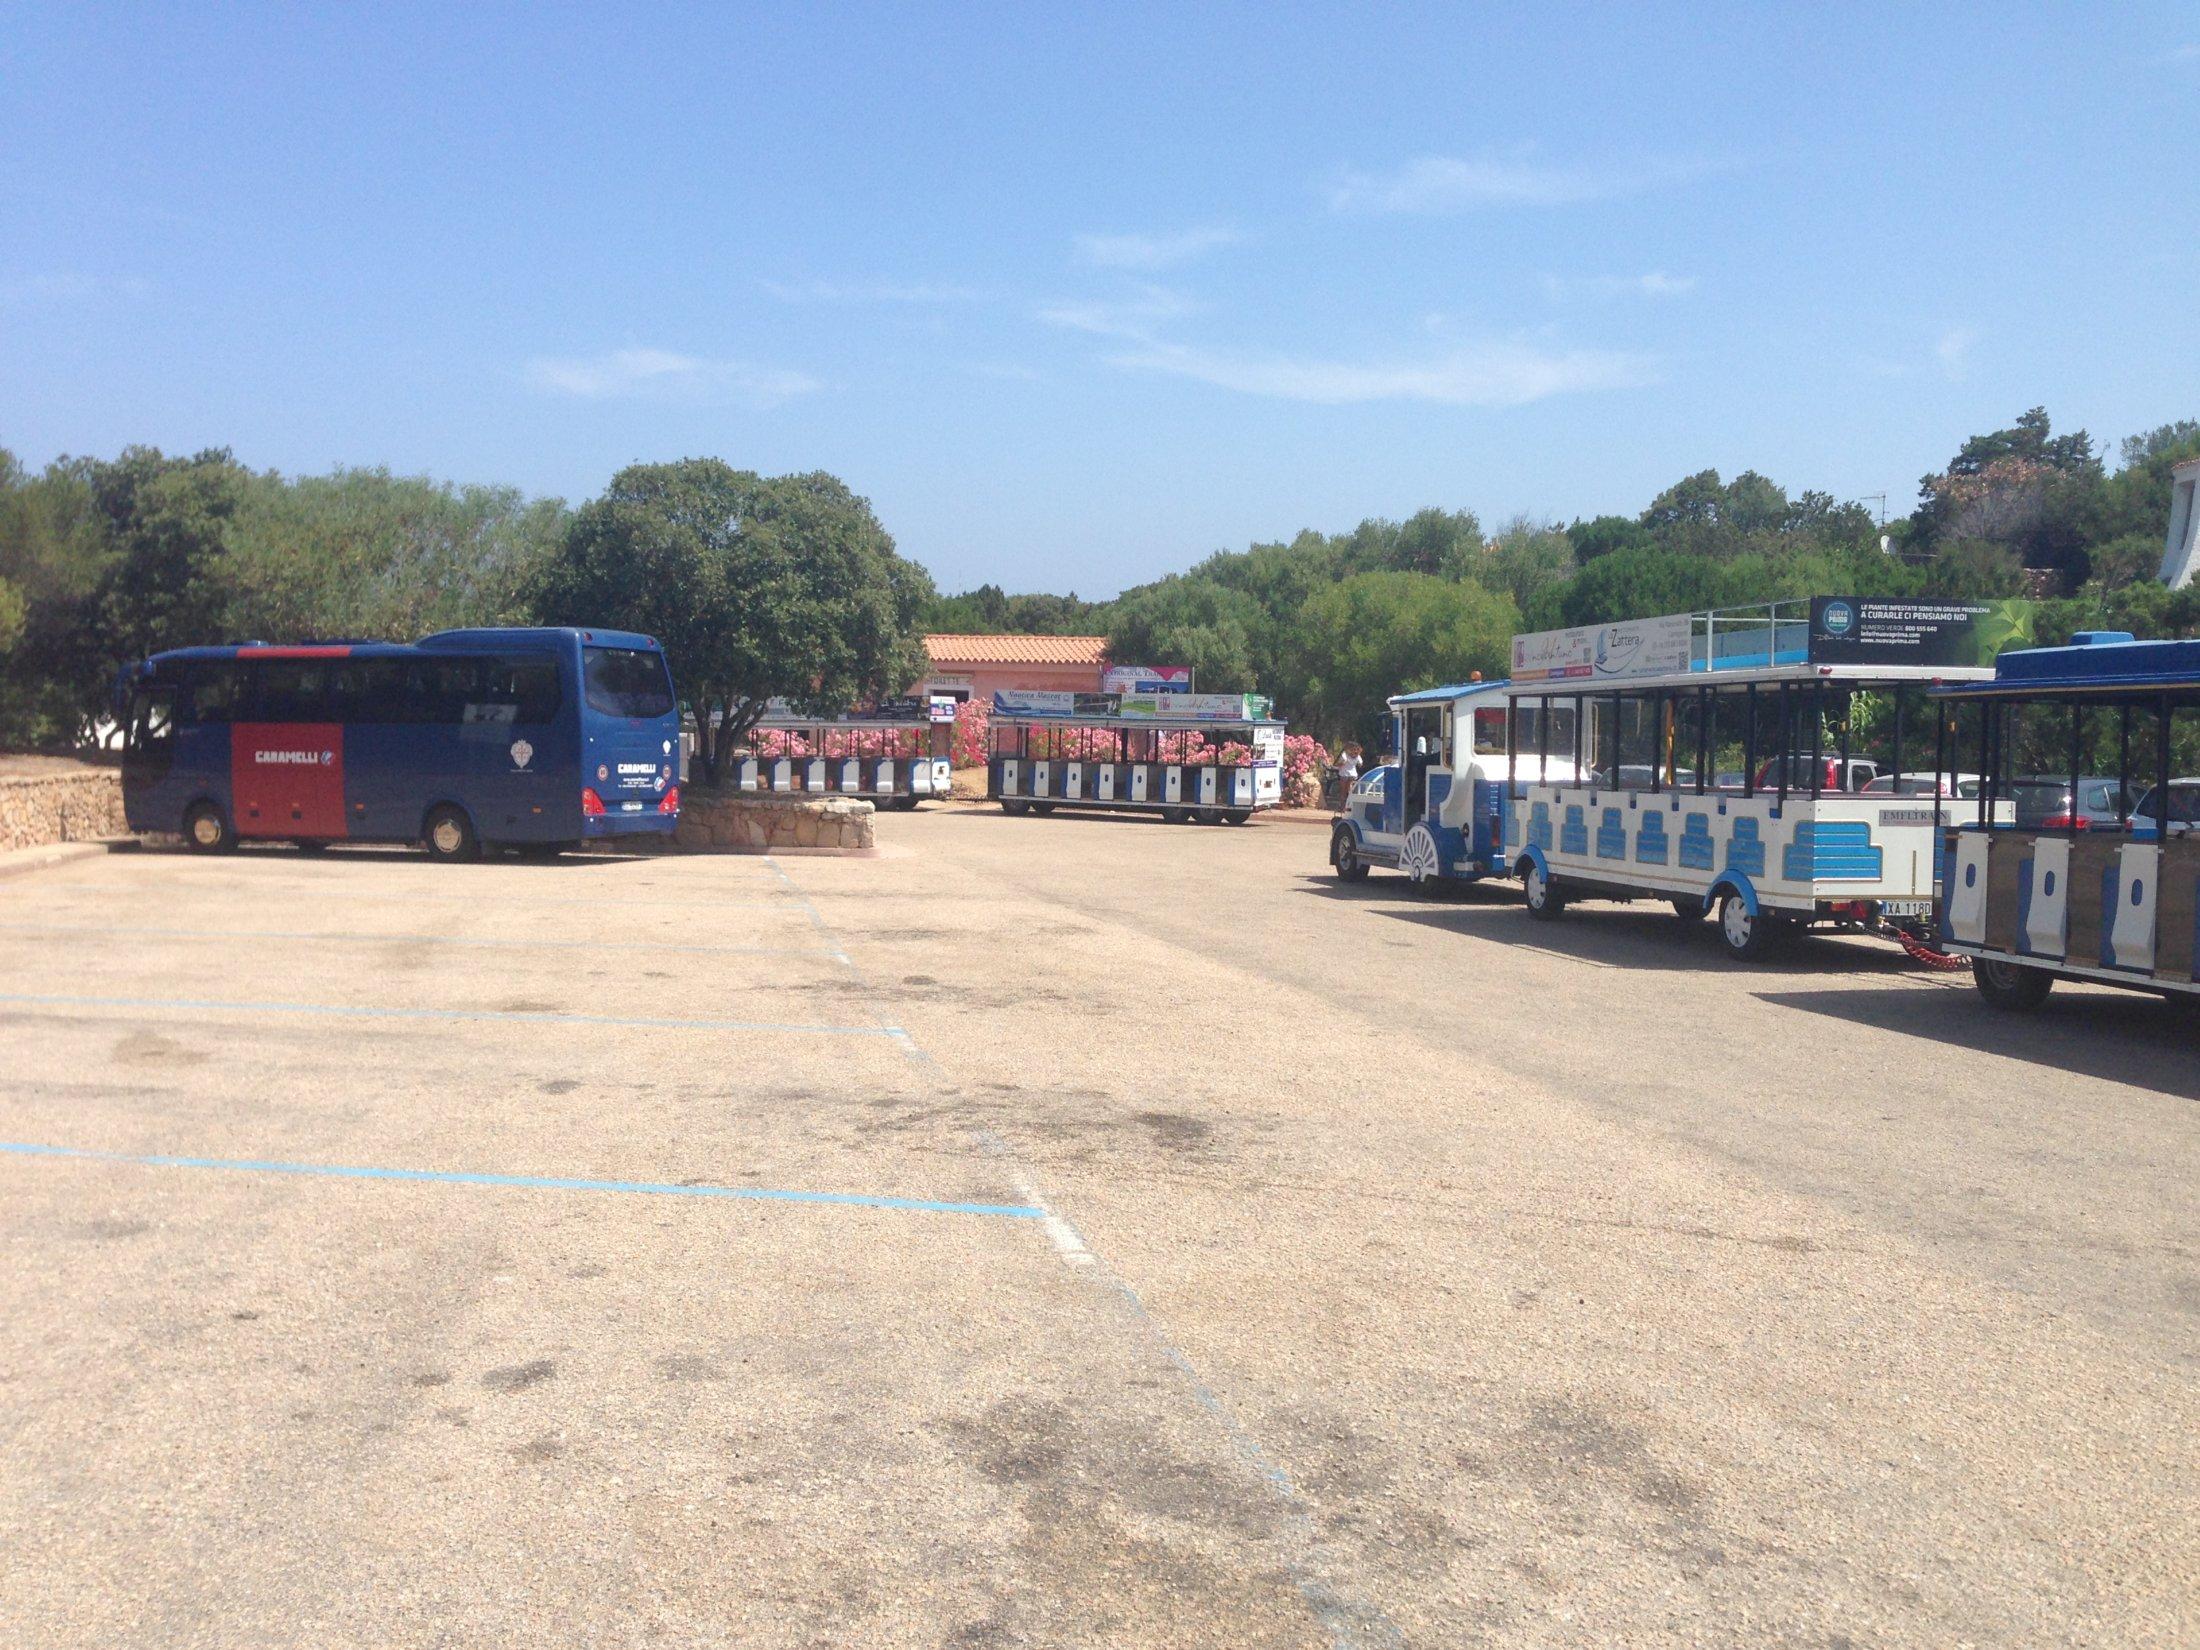 Parking autobus Porto cervo